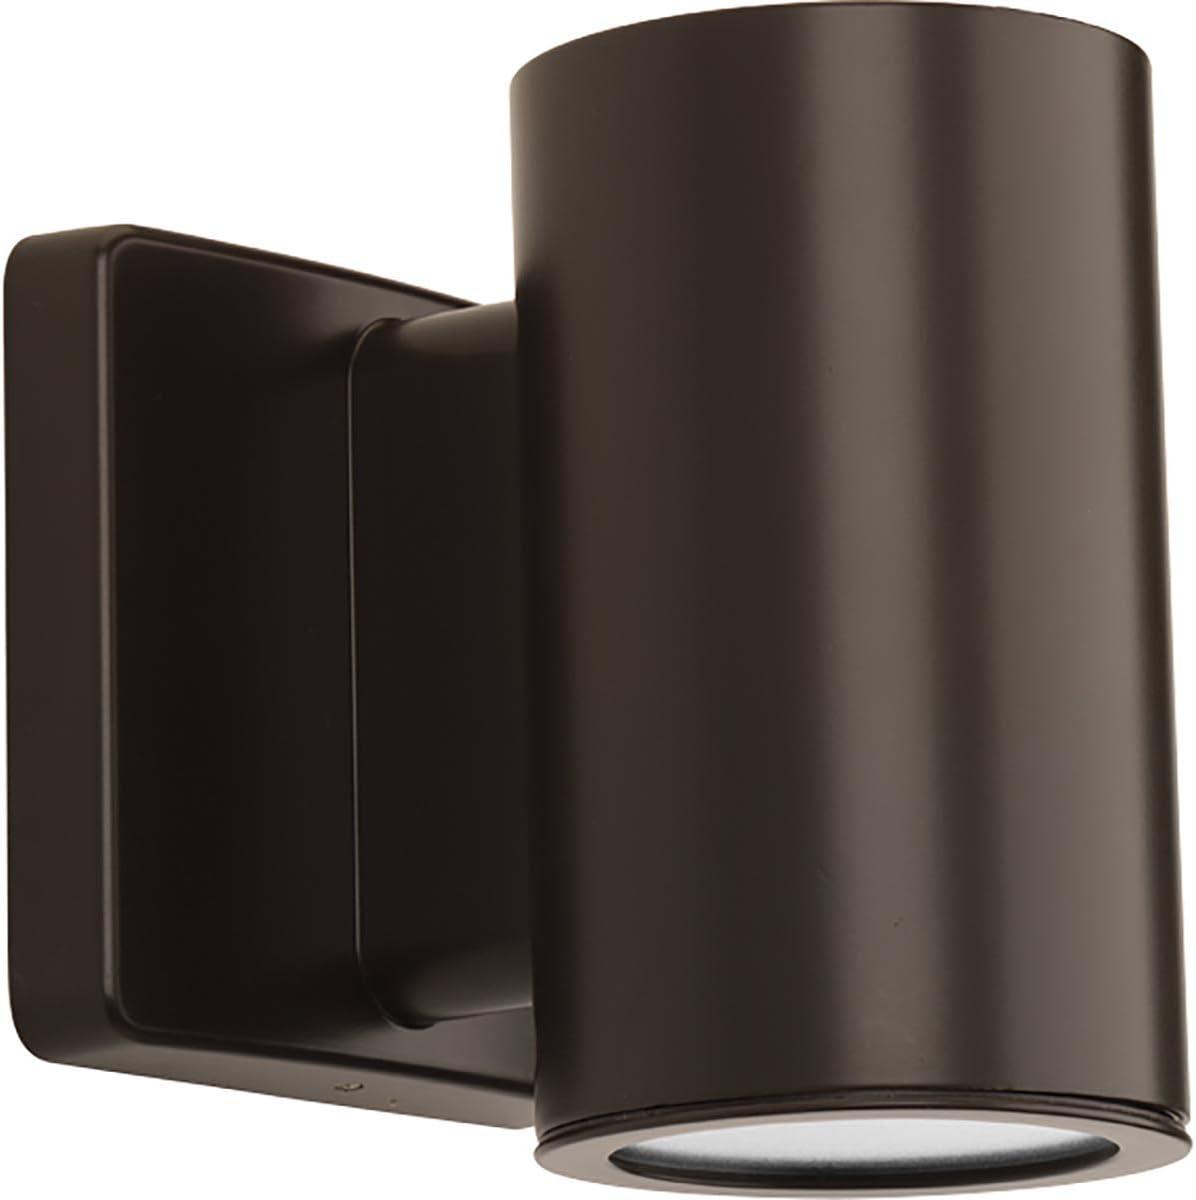 Progress Lighting P563000-020-30K 3IN Cylinders Wall Lantern, Brown